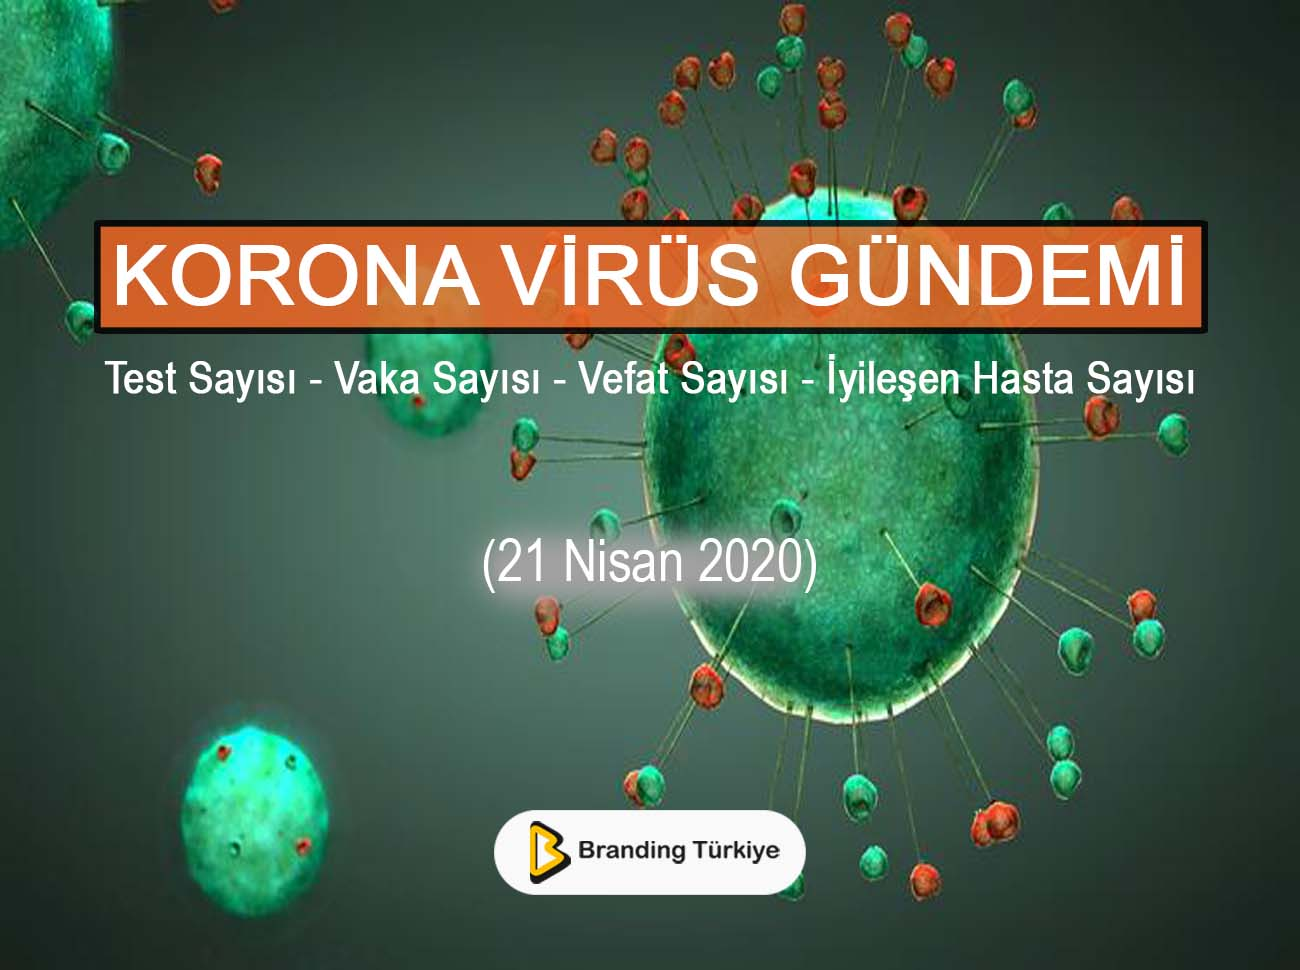 Korona Virüs Gündemi (21 Nisan 2020)